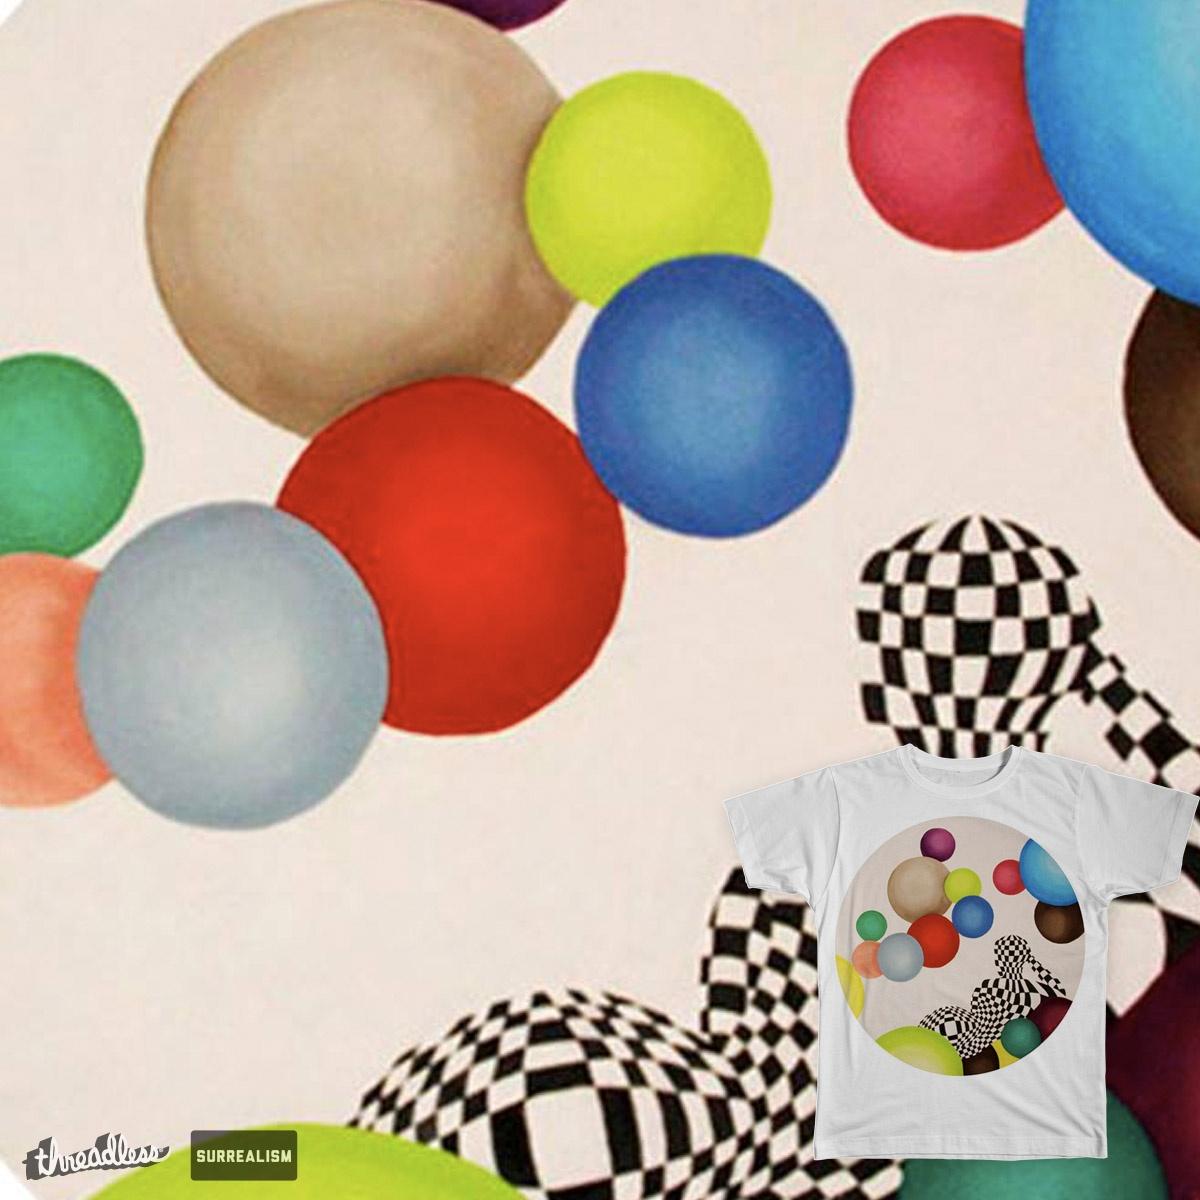 Spheric by Fersepulveda on Threadless